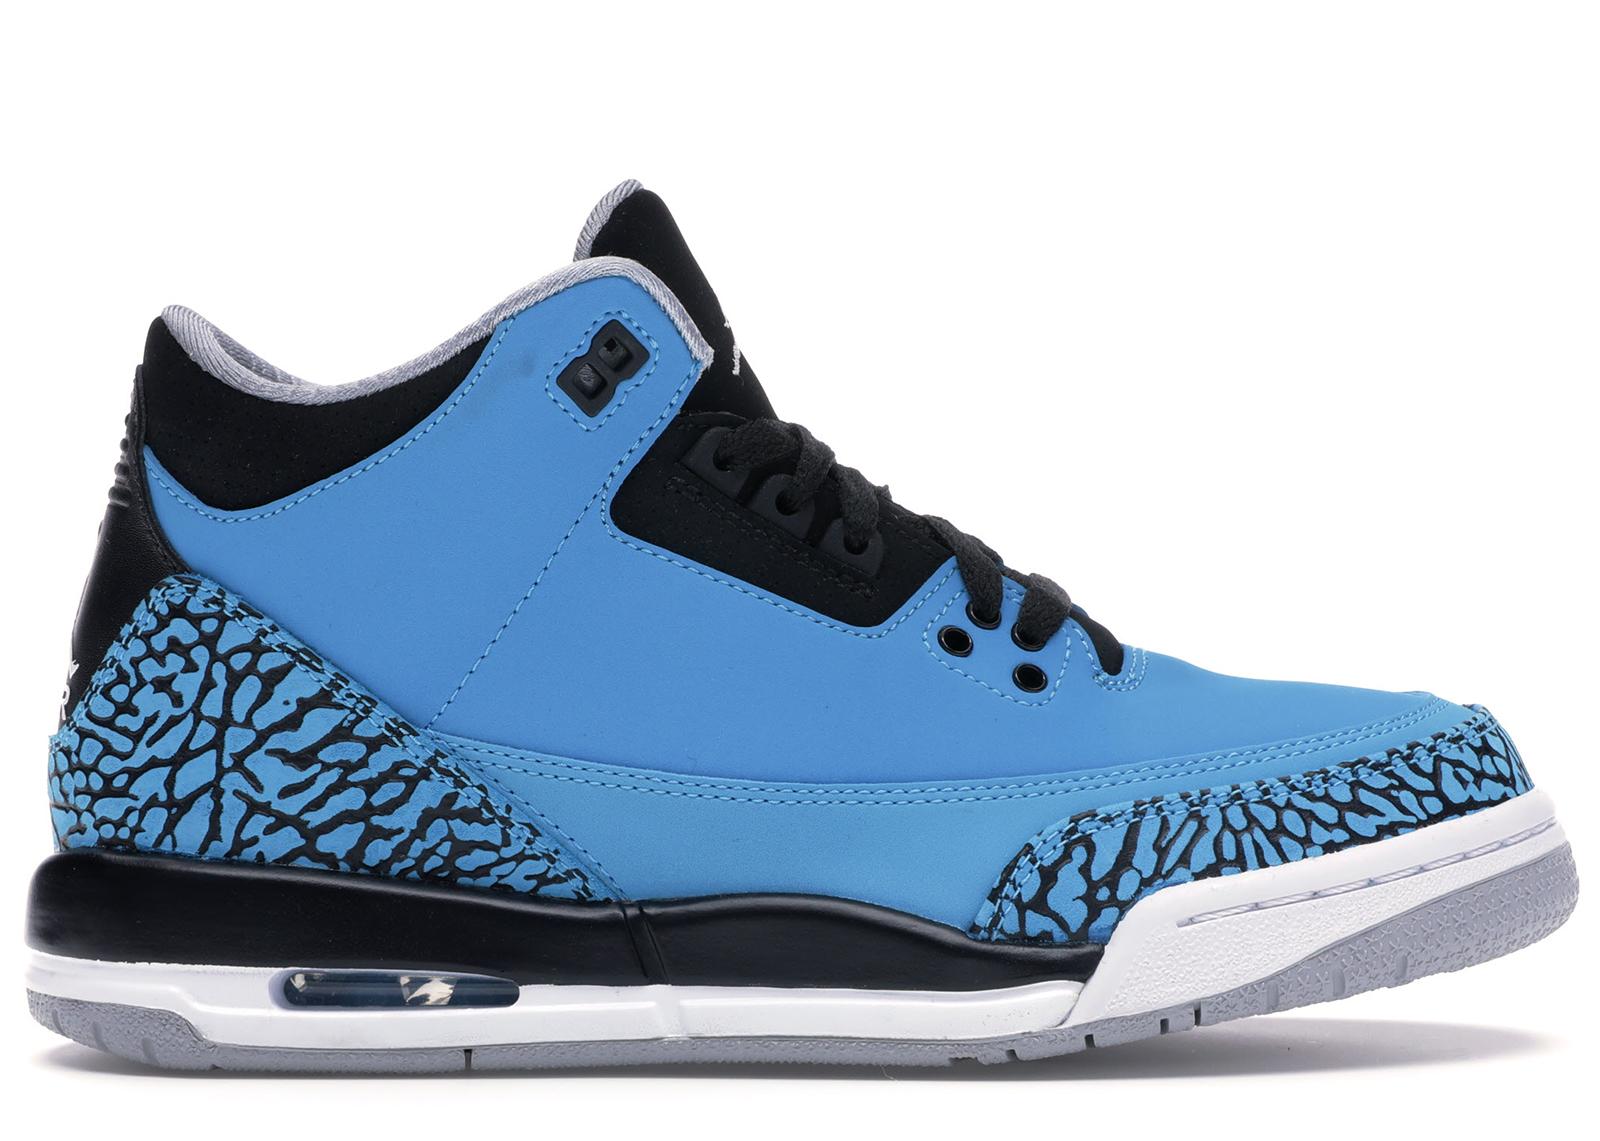 Jordan 3 Retro Powder Blue (GS